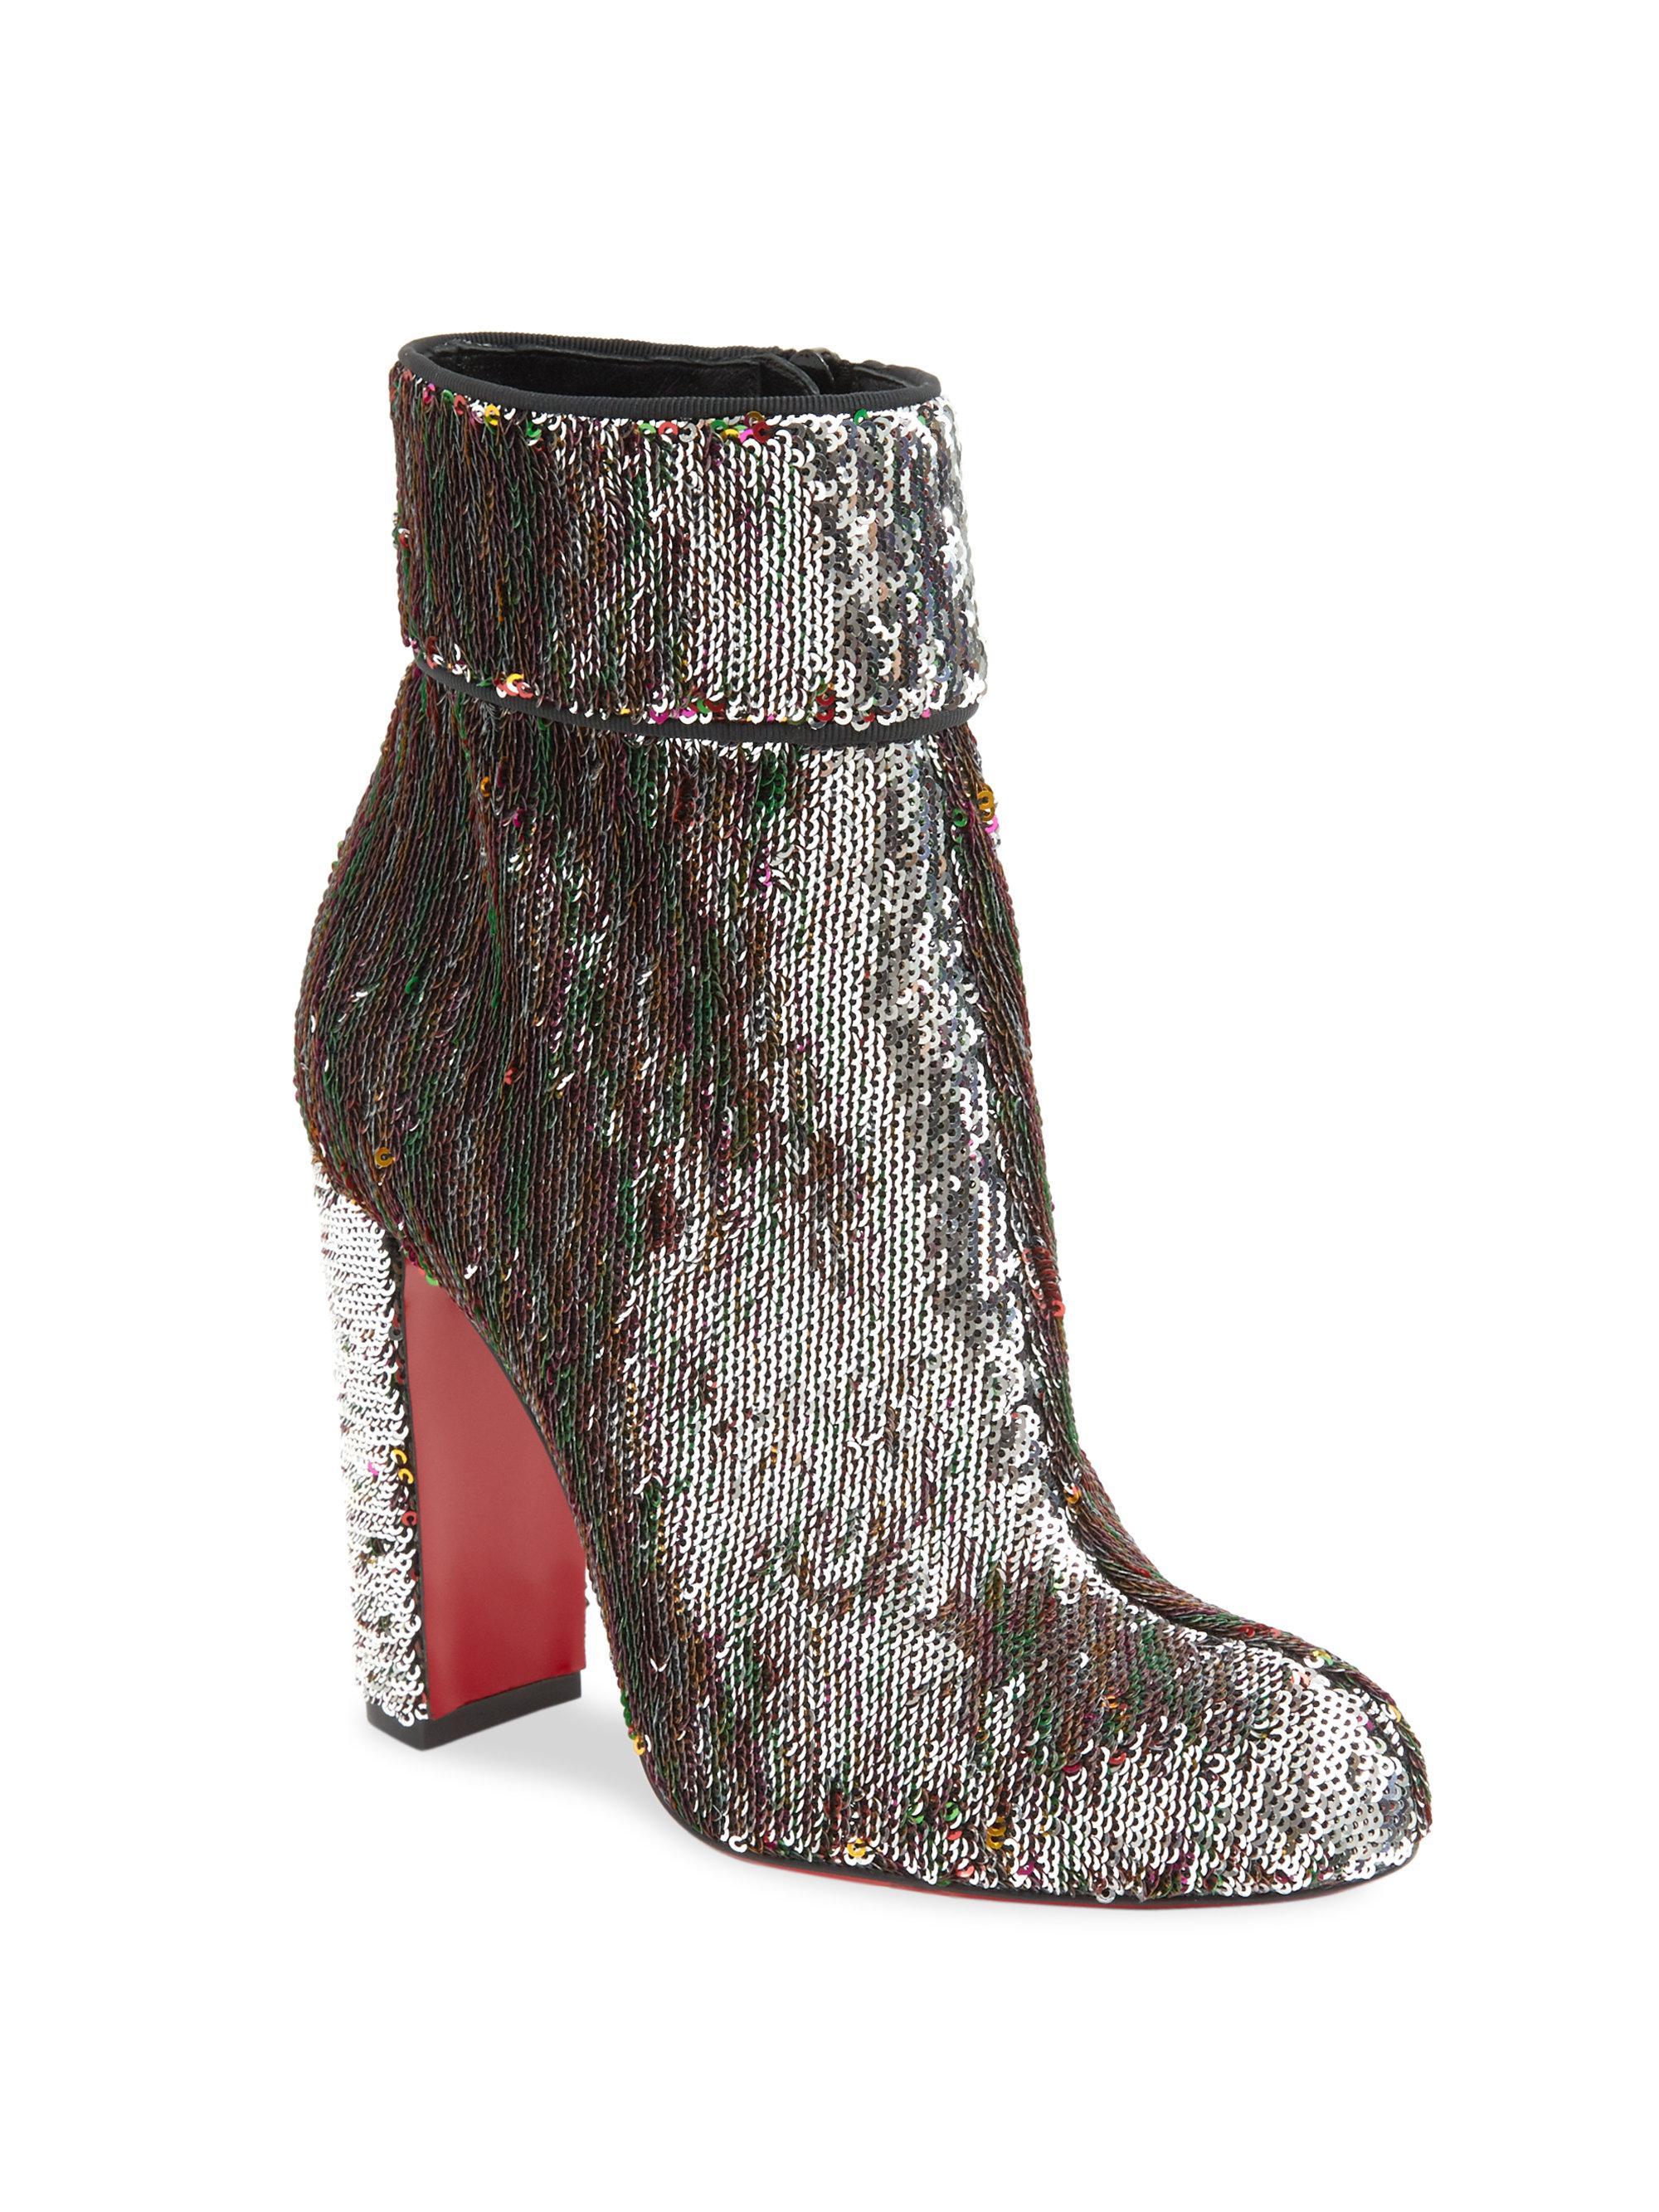 1724074e2d68 Lyst - Christian Louboutin Moulamax 85 Sequin Block Heel Booties